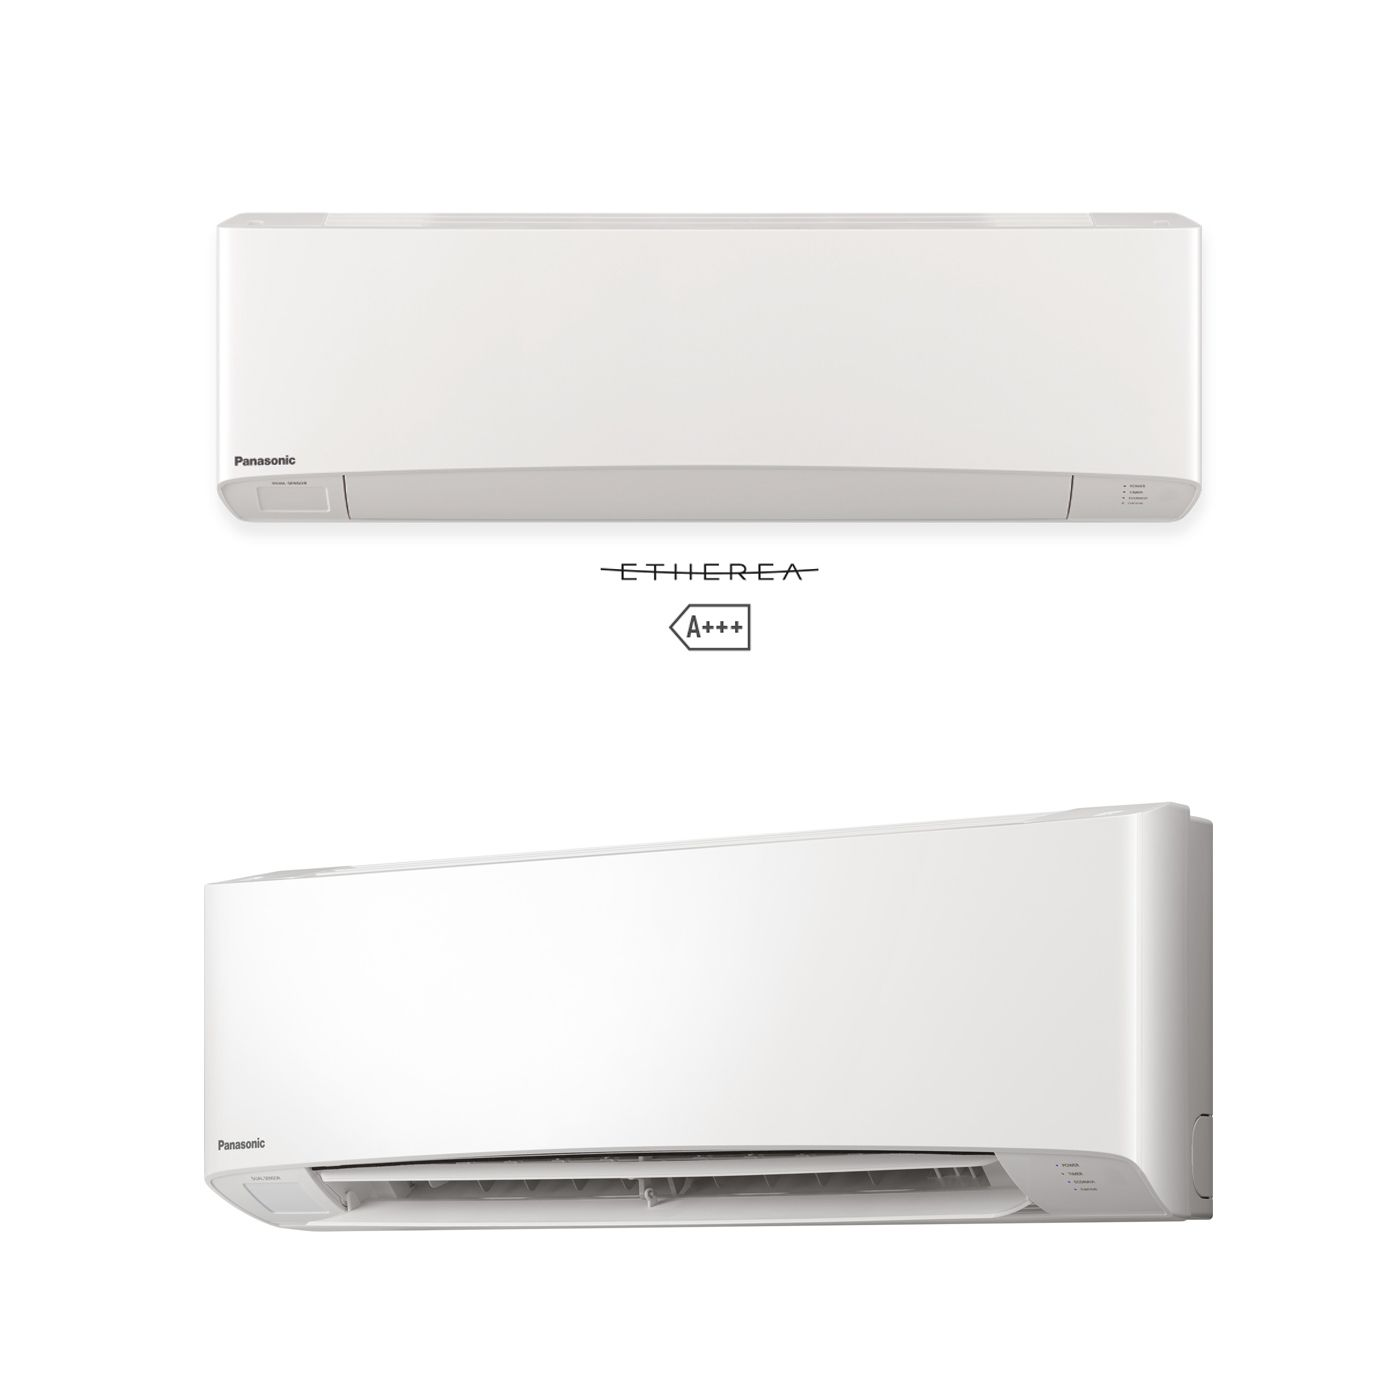 Panasonic Air Conditioning Etherea CS-Z50TKEW Wall Mounted